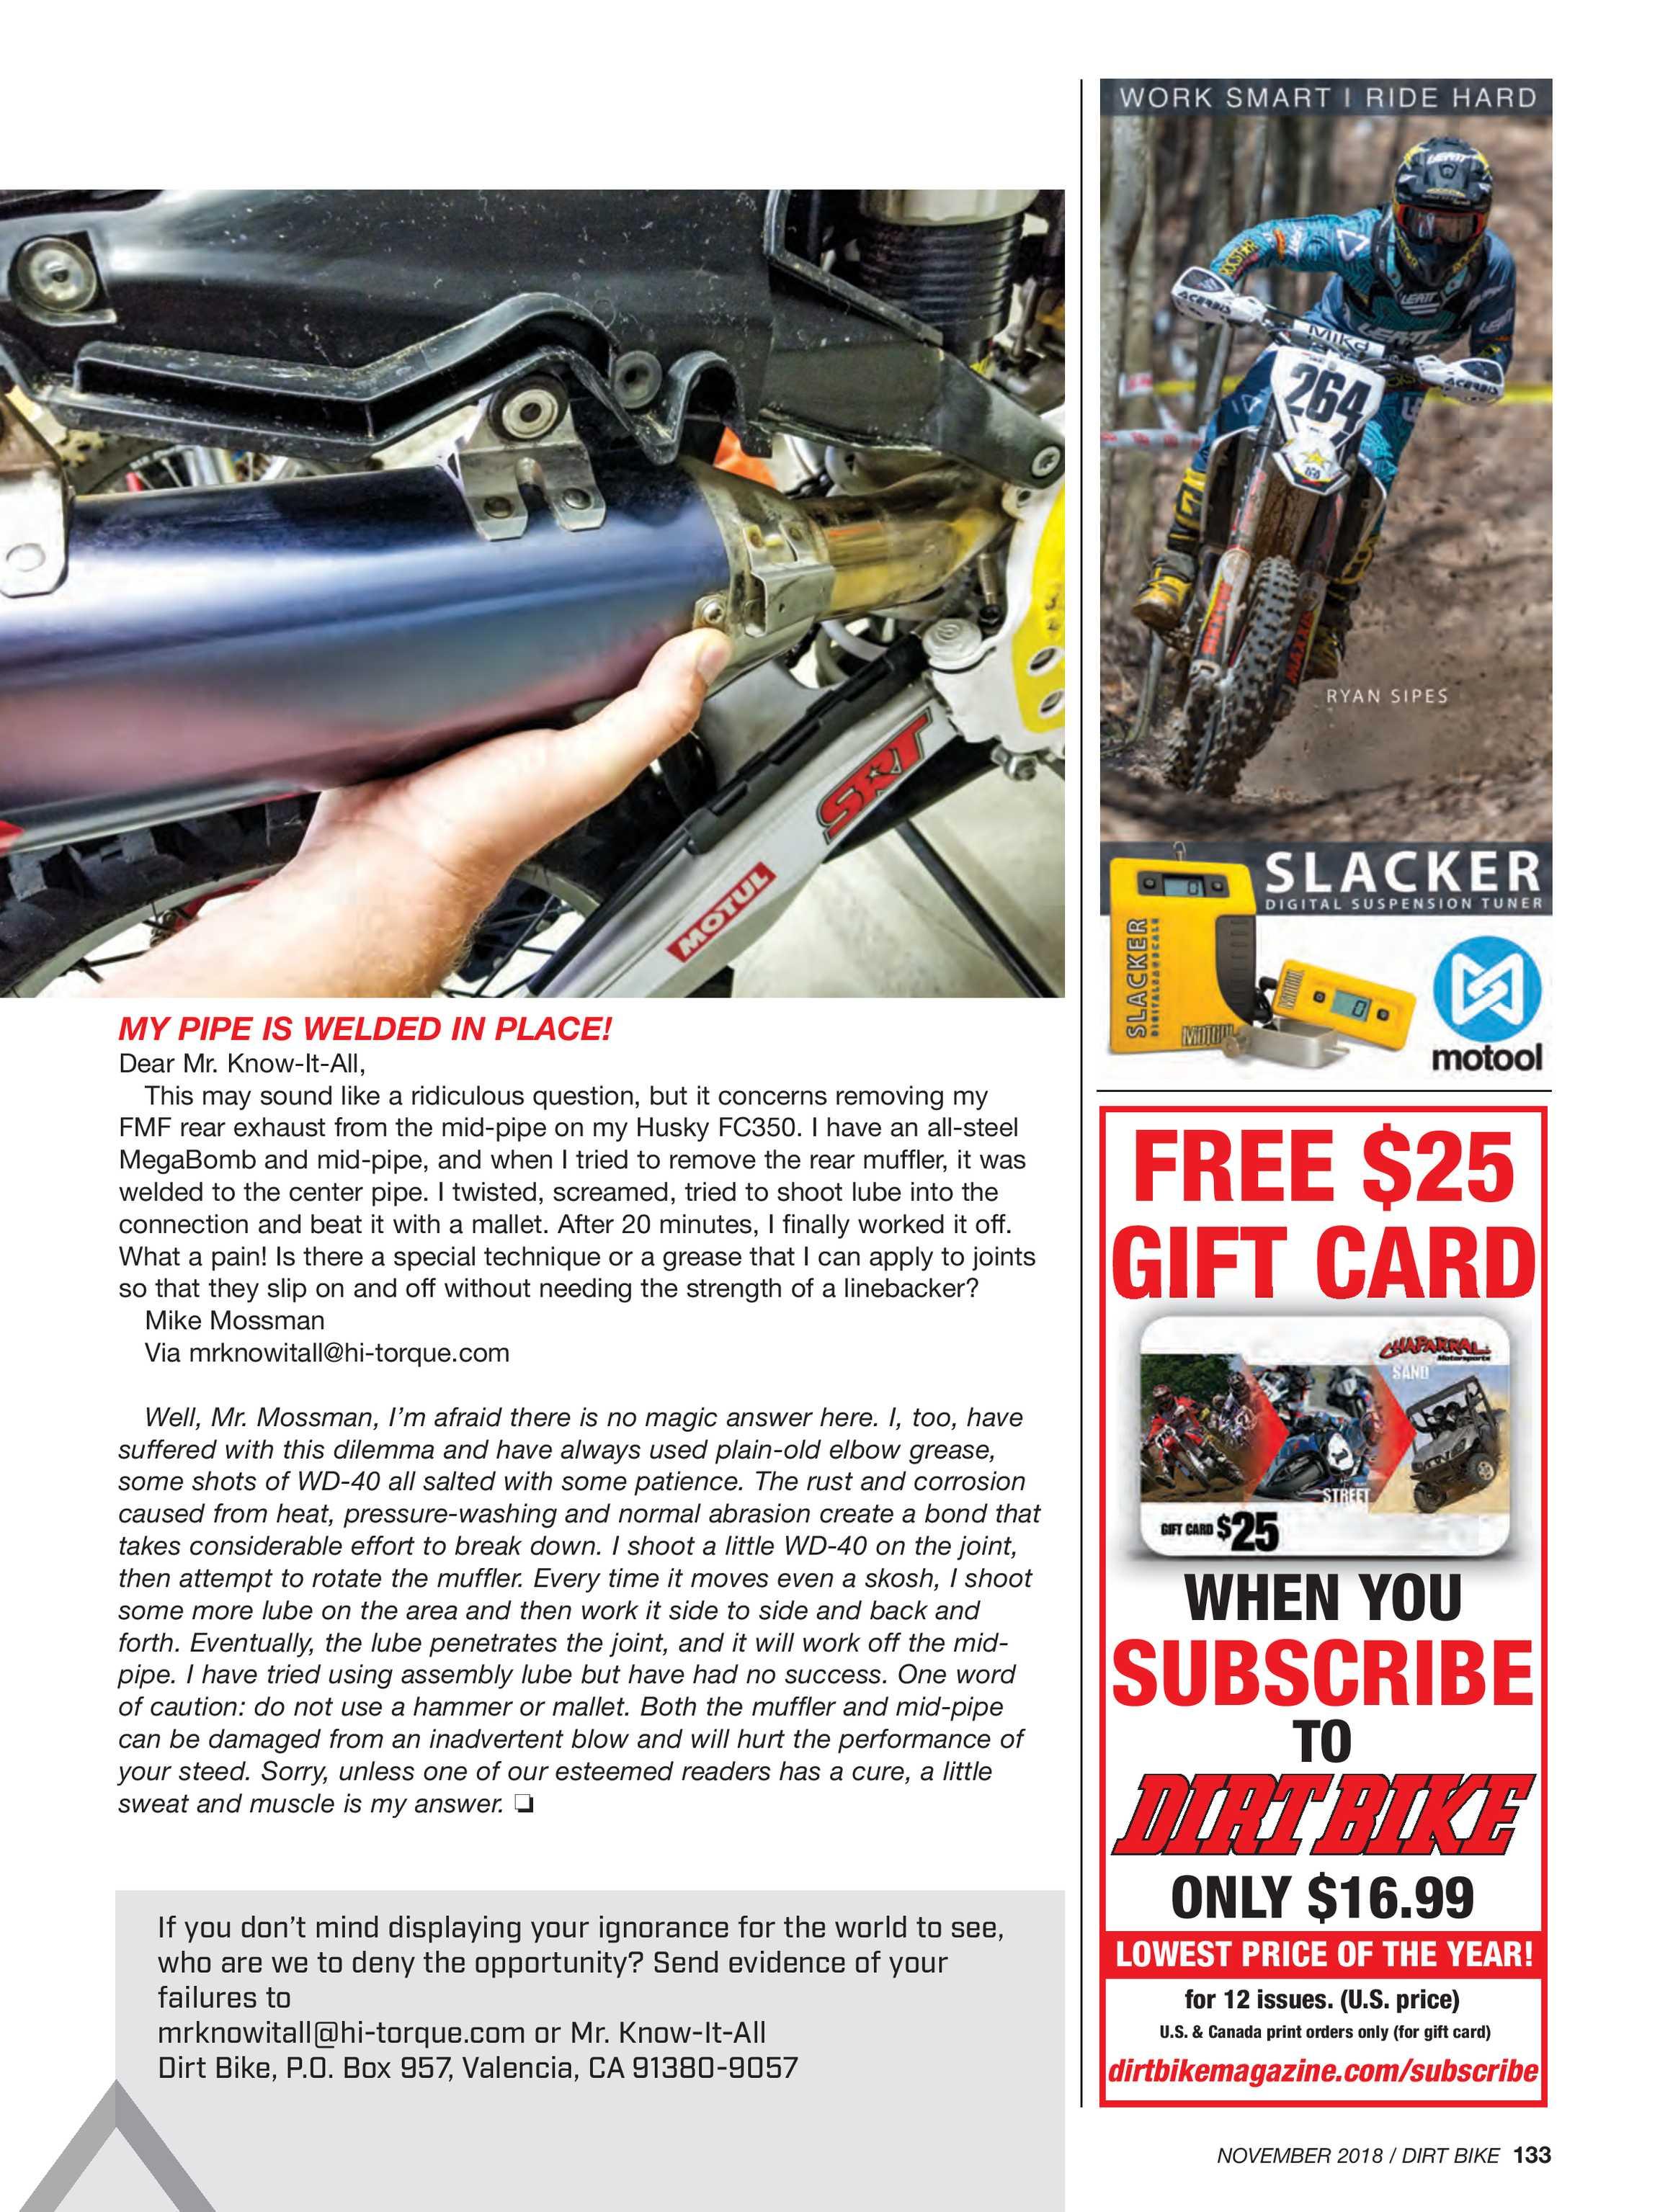 Dirt Bike Magazine - November 2018 - page 133